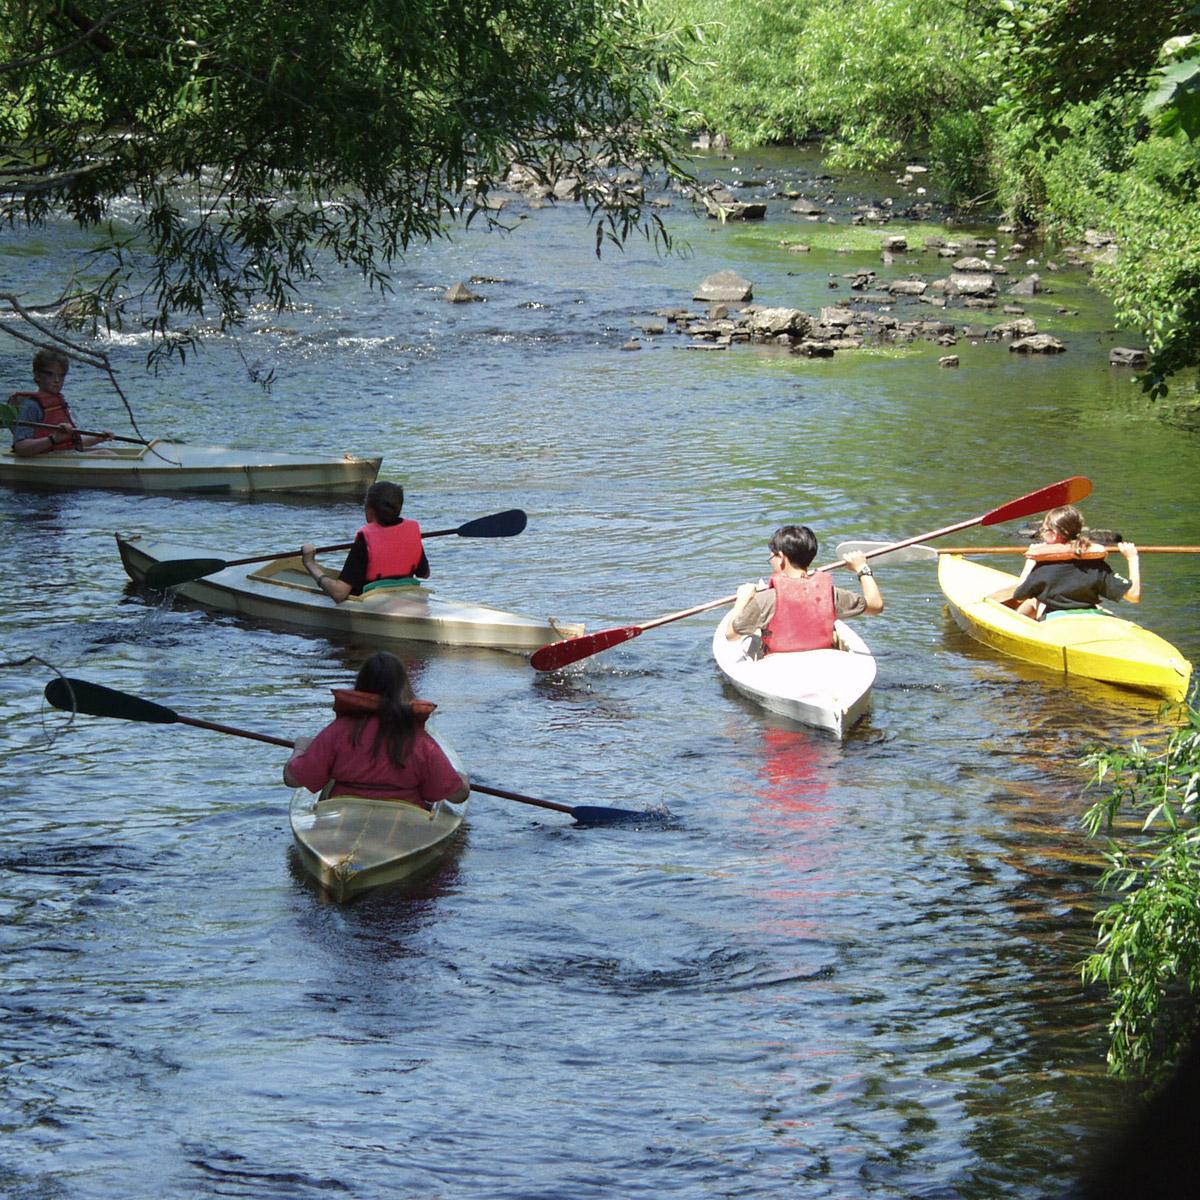 Skin on Frame Kayak | The Eli Whitney Museum and Workshop